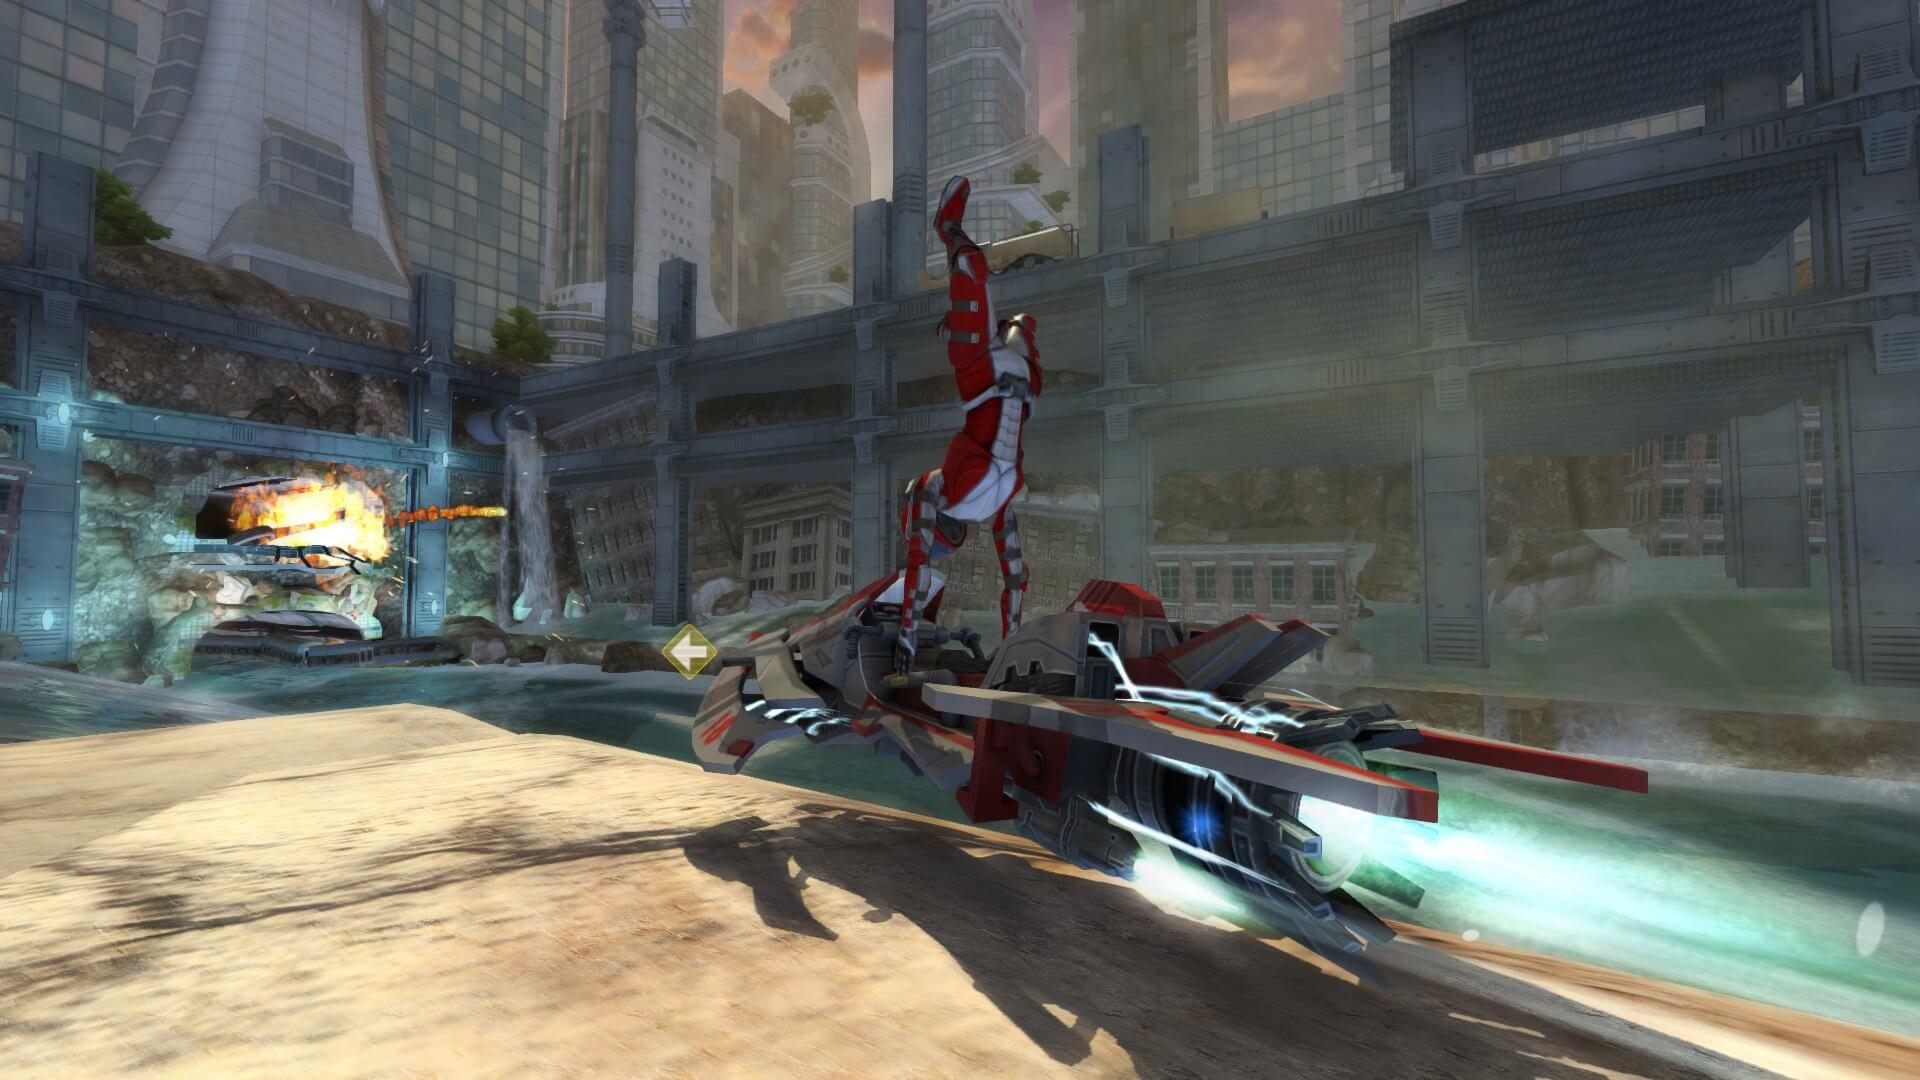 Riptide GP: Renegade nabídne futuristické závody 113444